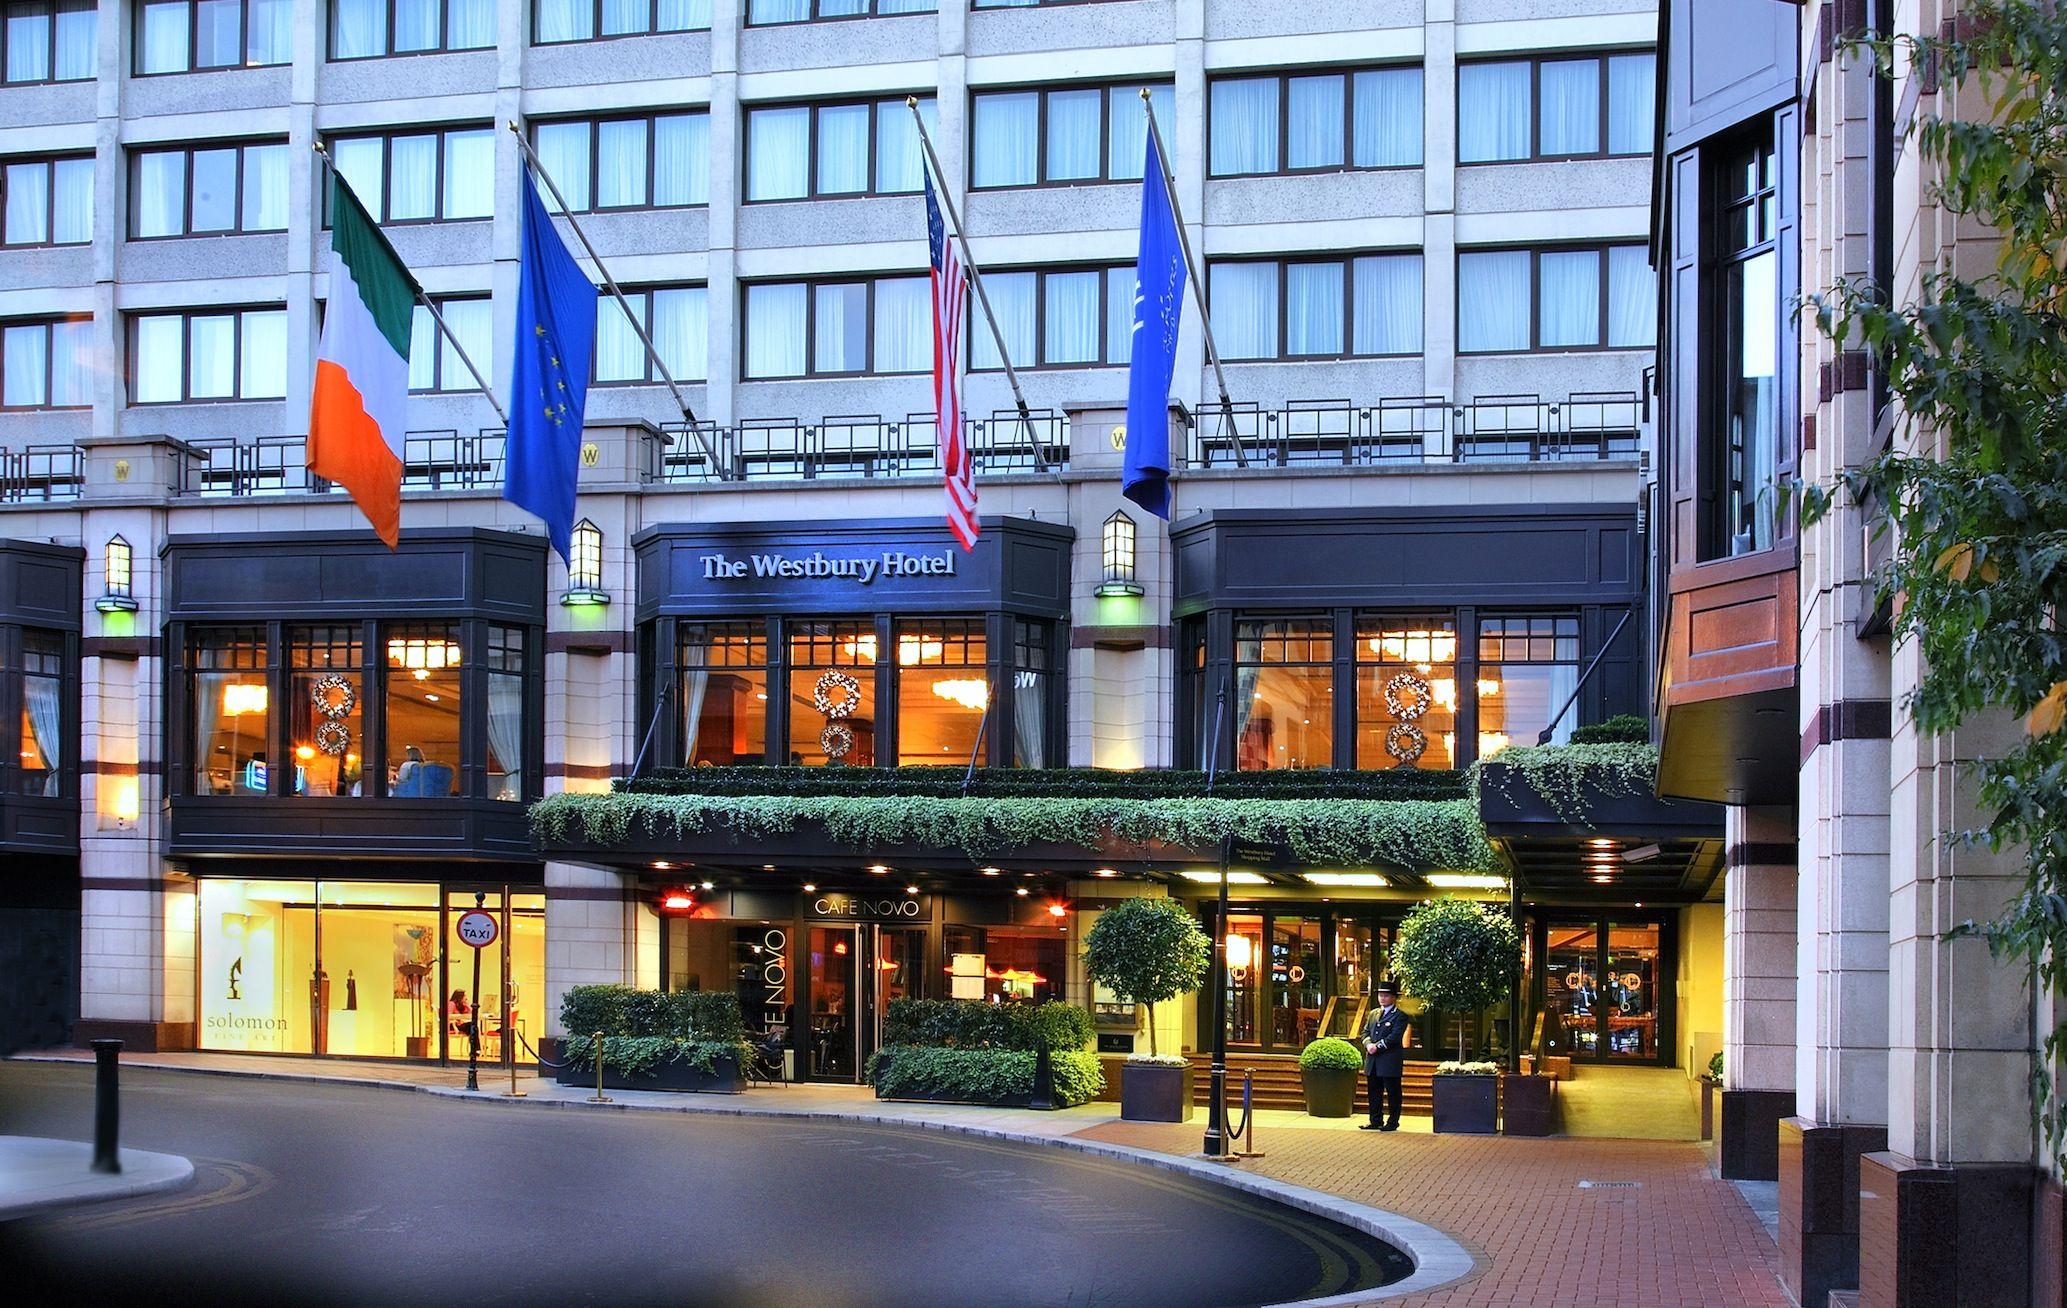 TGIF An overnight stay in the Westbury hotel & a super